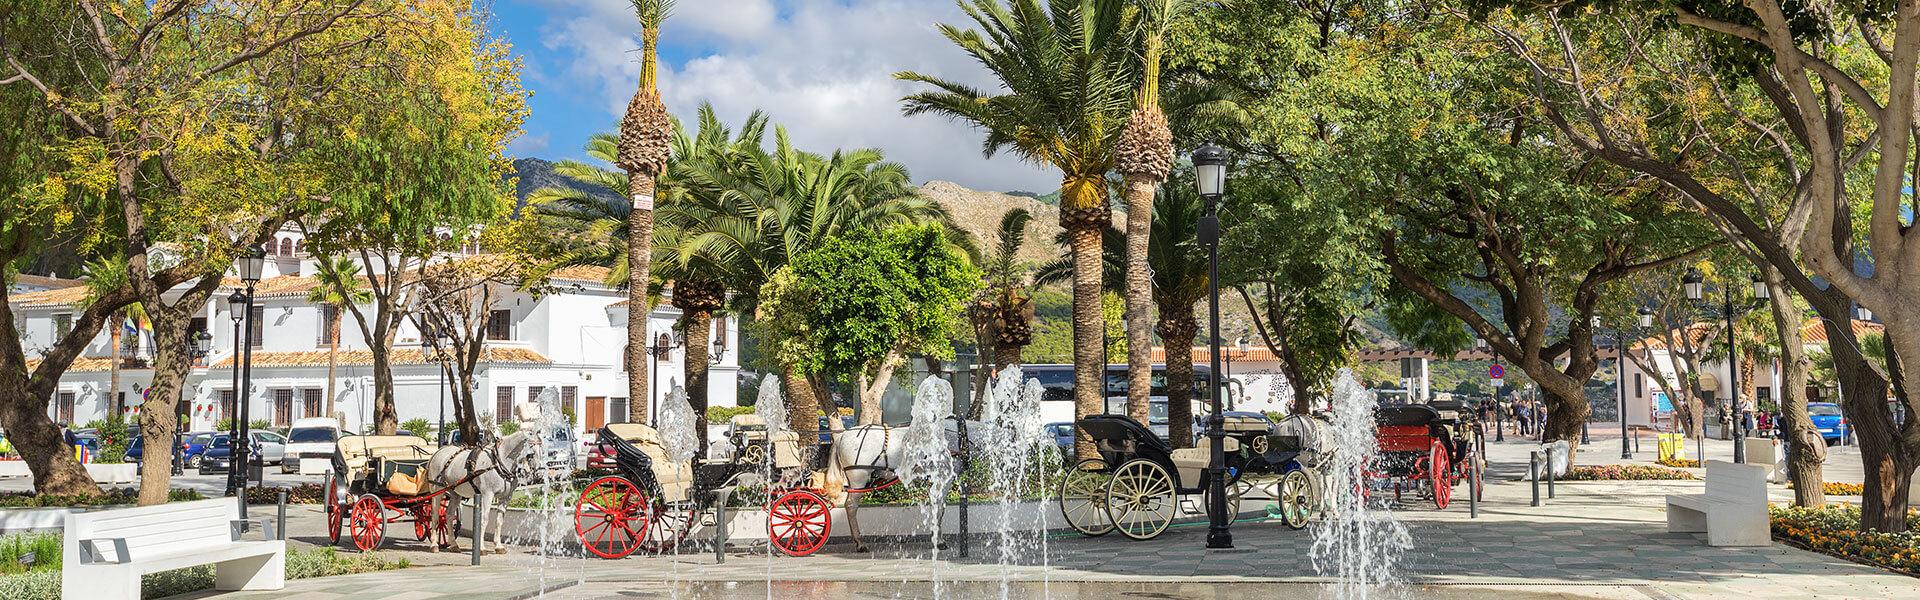 Firmenreise nach Malaga - die Perle Andalusiens mit b-ceed